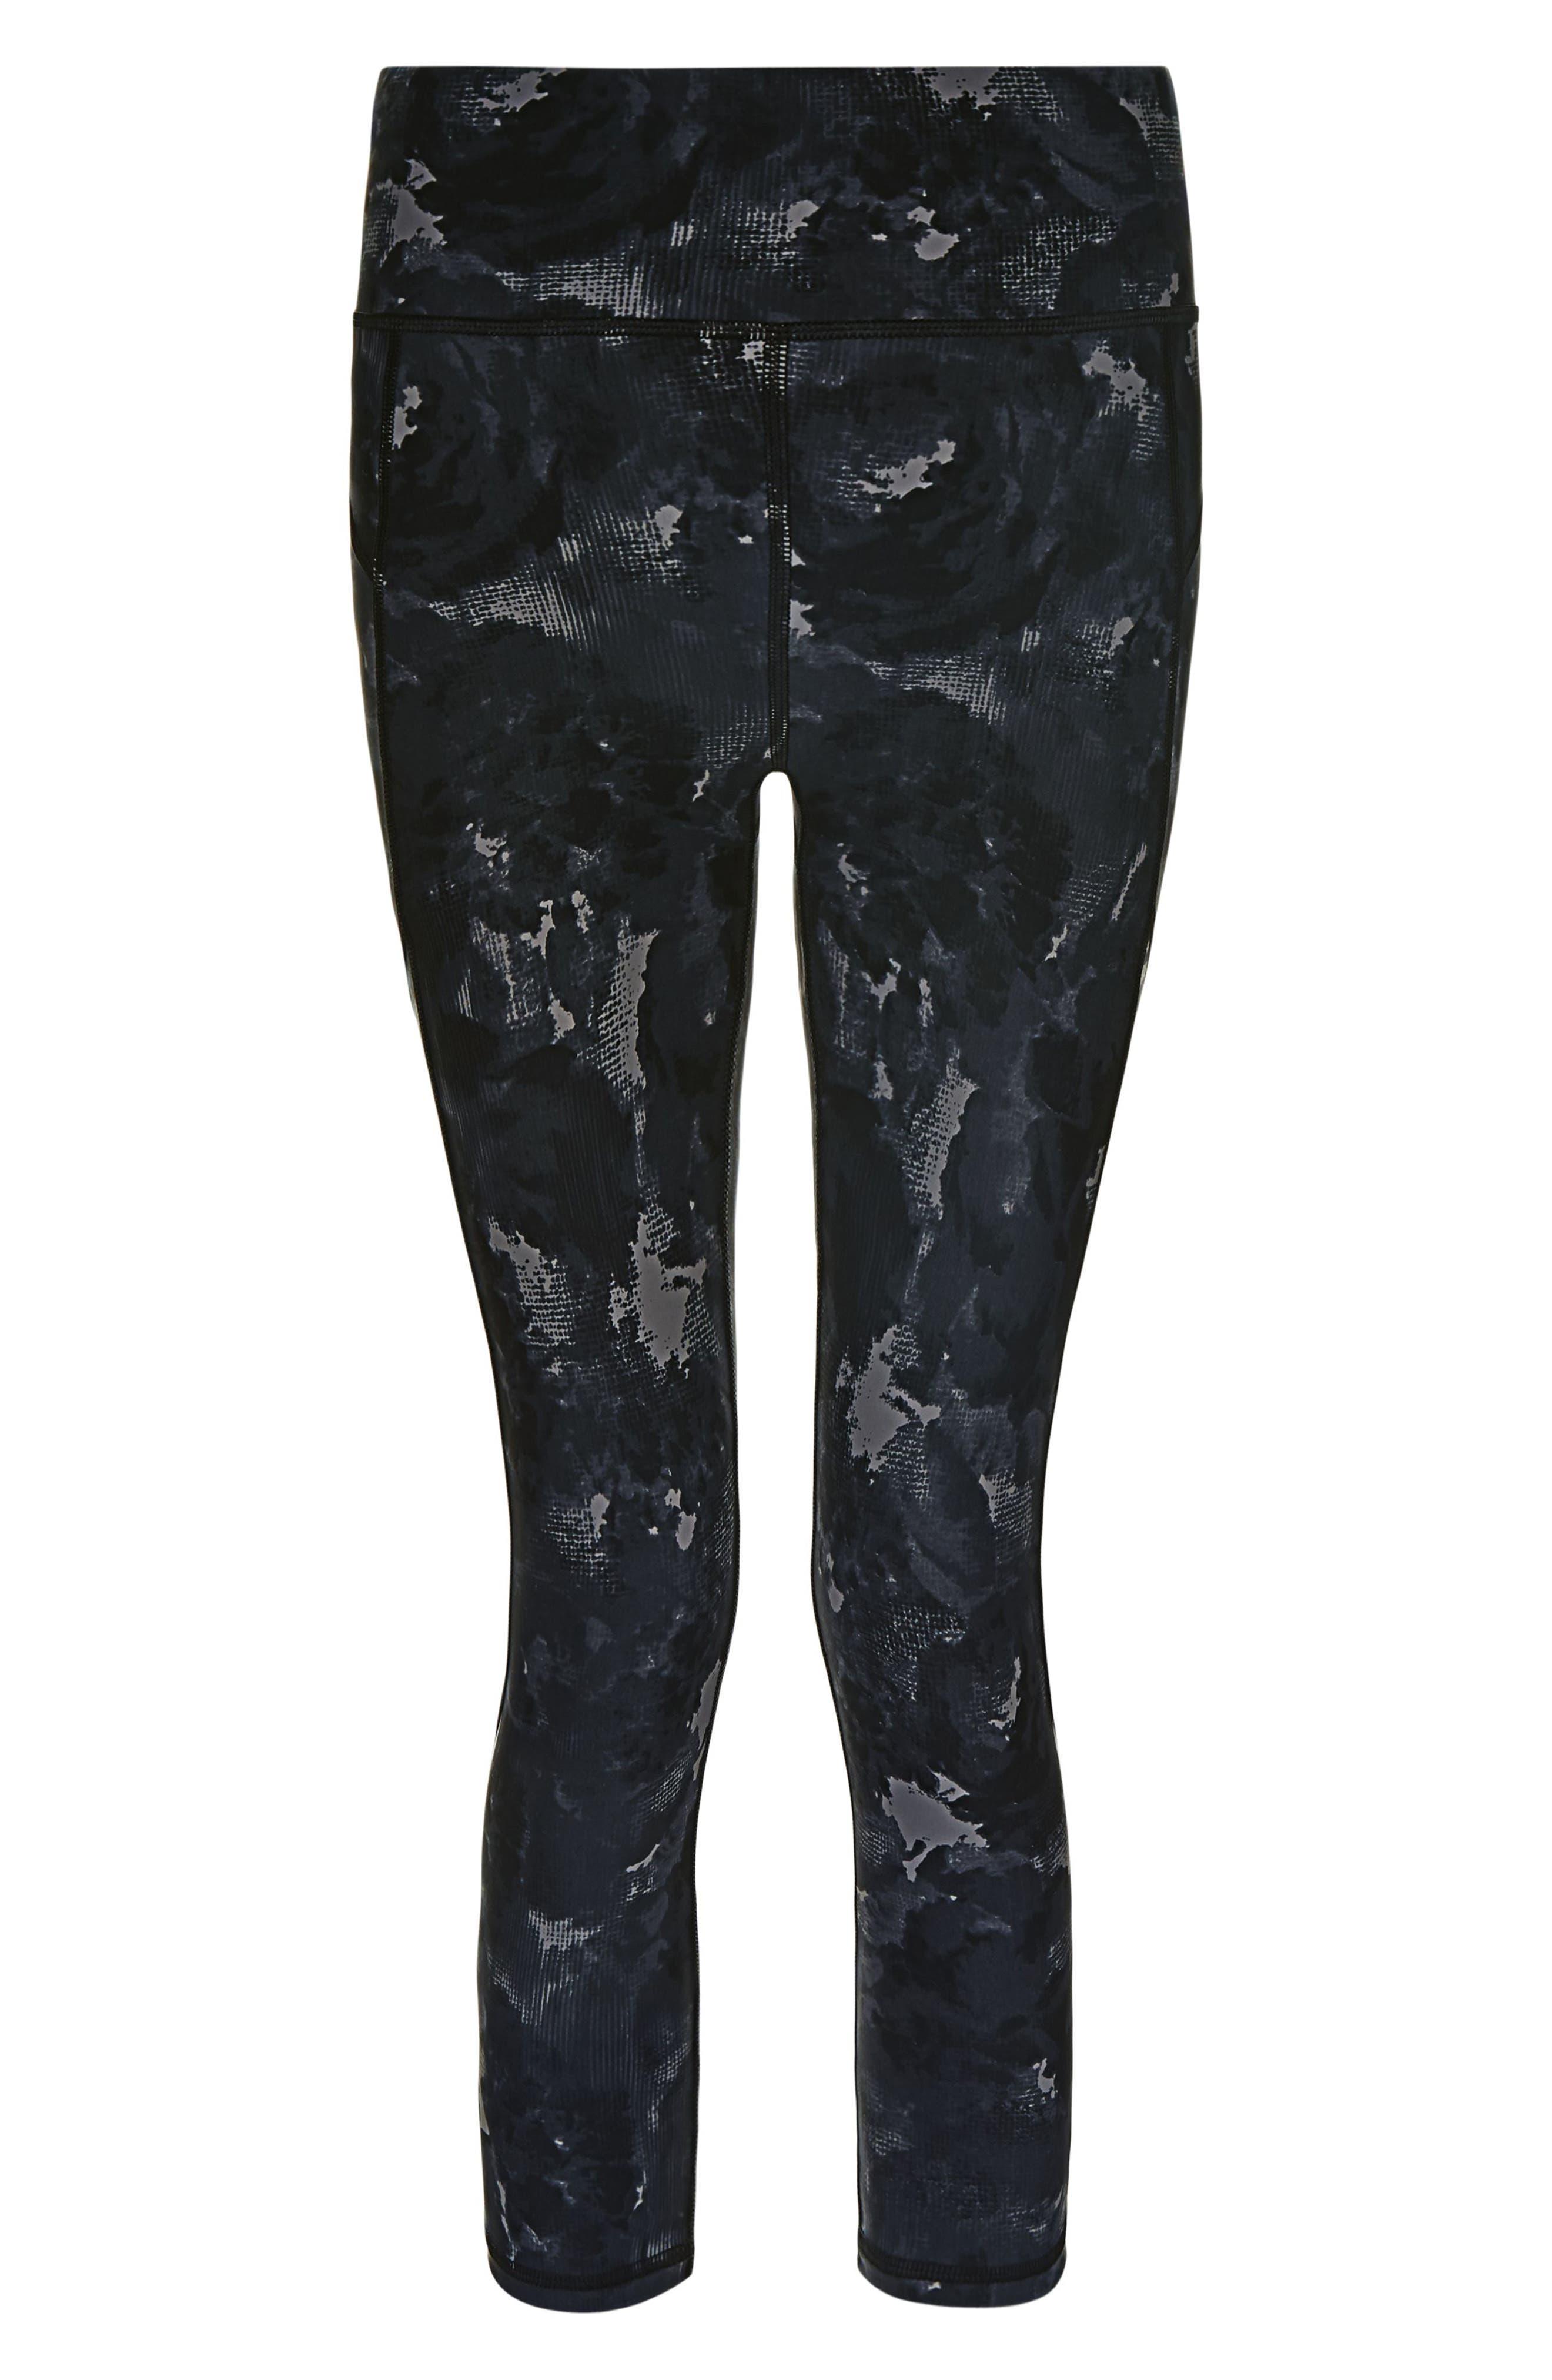 Zero Gravity Crop Leggings,                             Alternate thumbnail 6, color,                             BLACK MARKET FLORAL PRINT